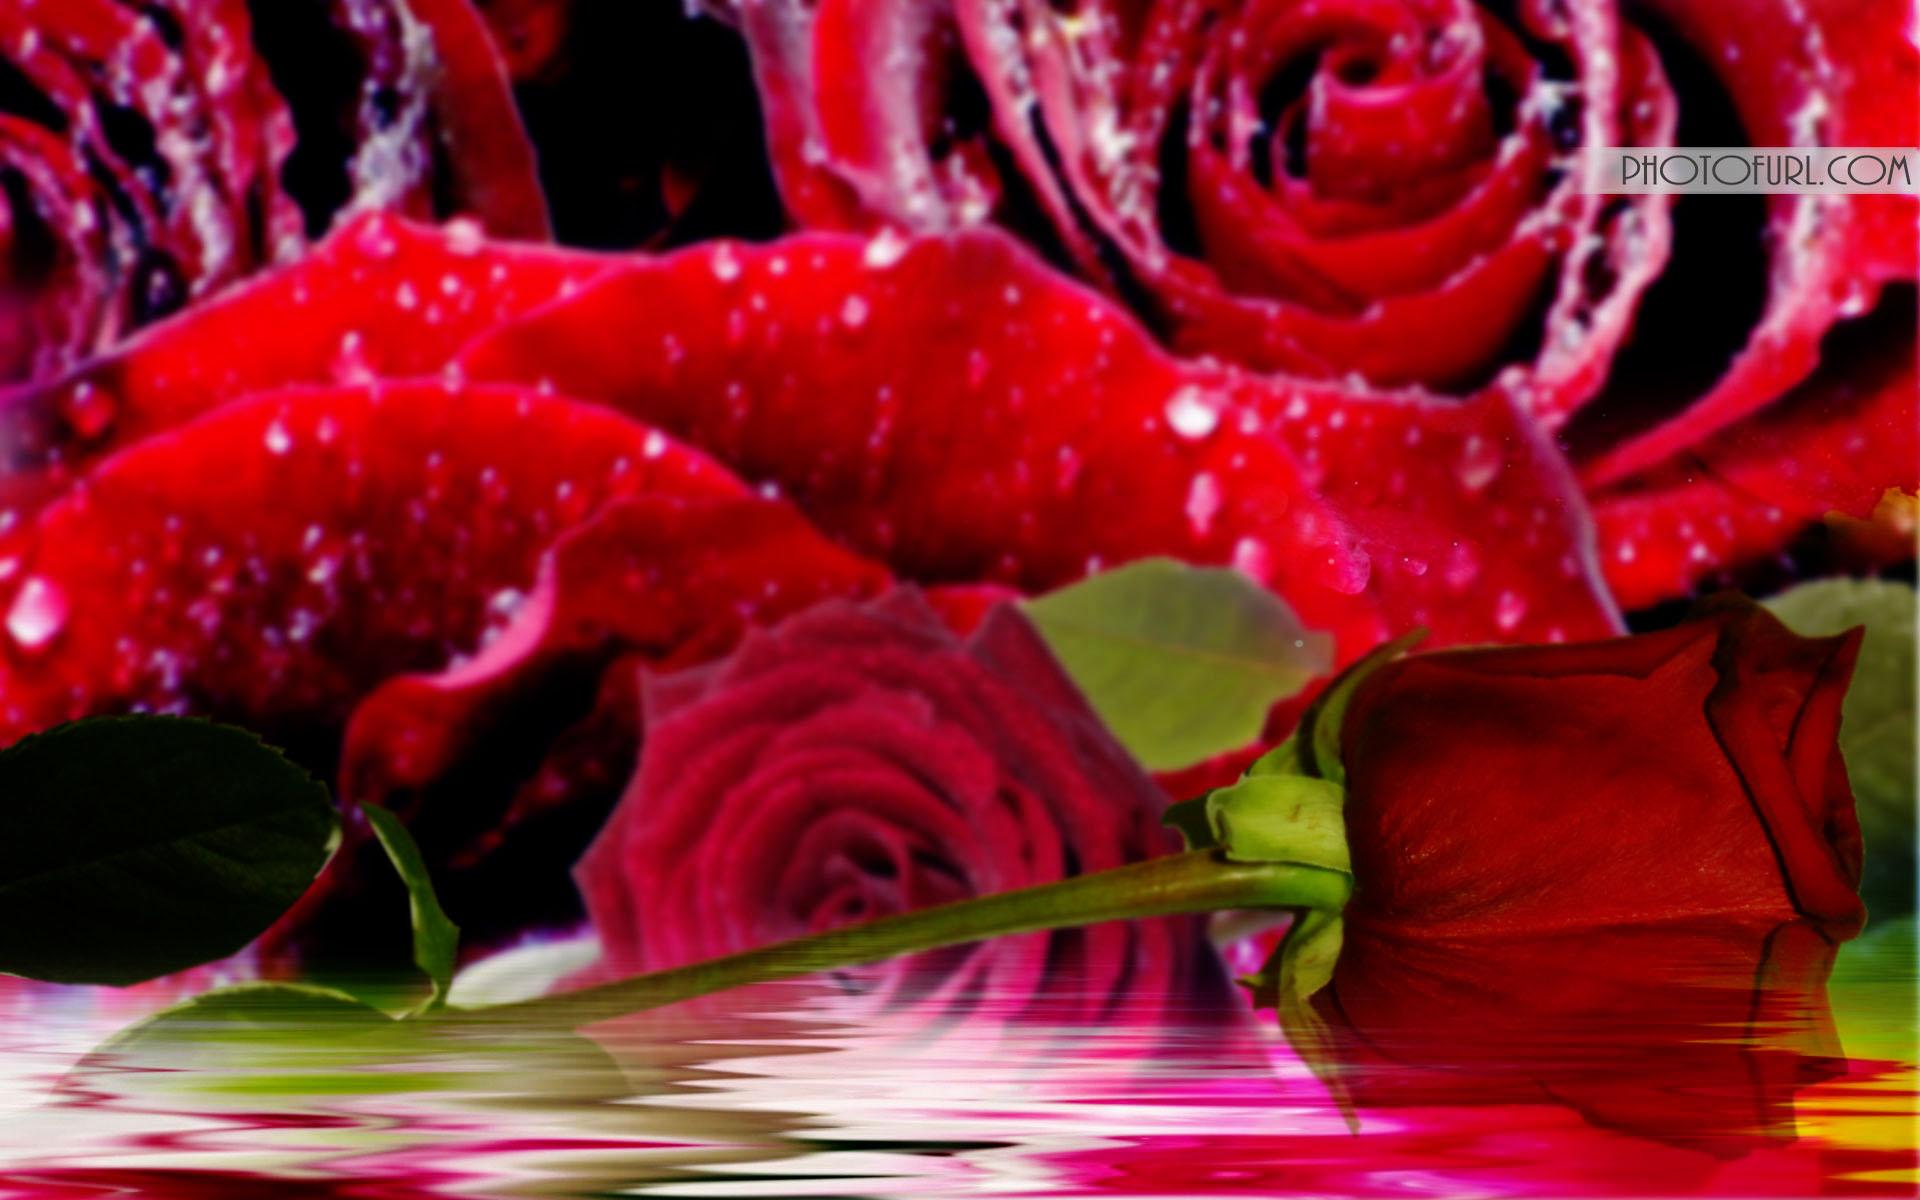 Guns N Roses Hd Wallpapers Backgrounds Wallpaper 1920x1200